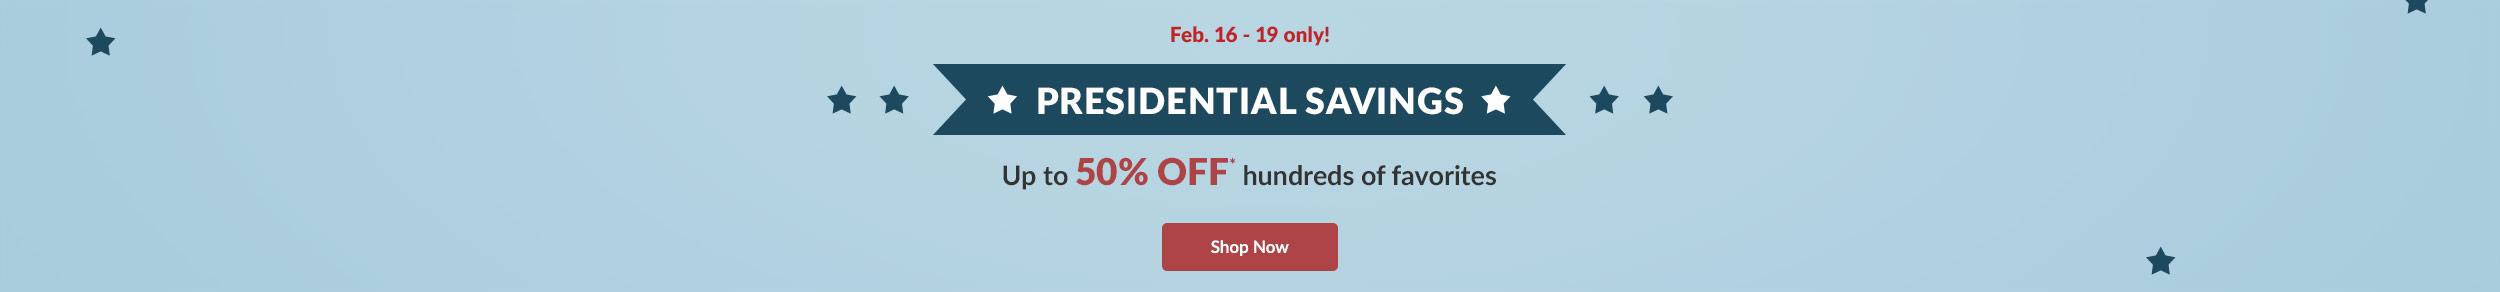 https://i3.pureformulas.net/images/static/Presidents_Day_Sale_Slide_021519.jpg